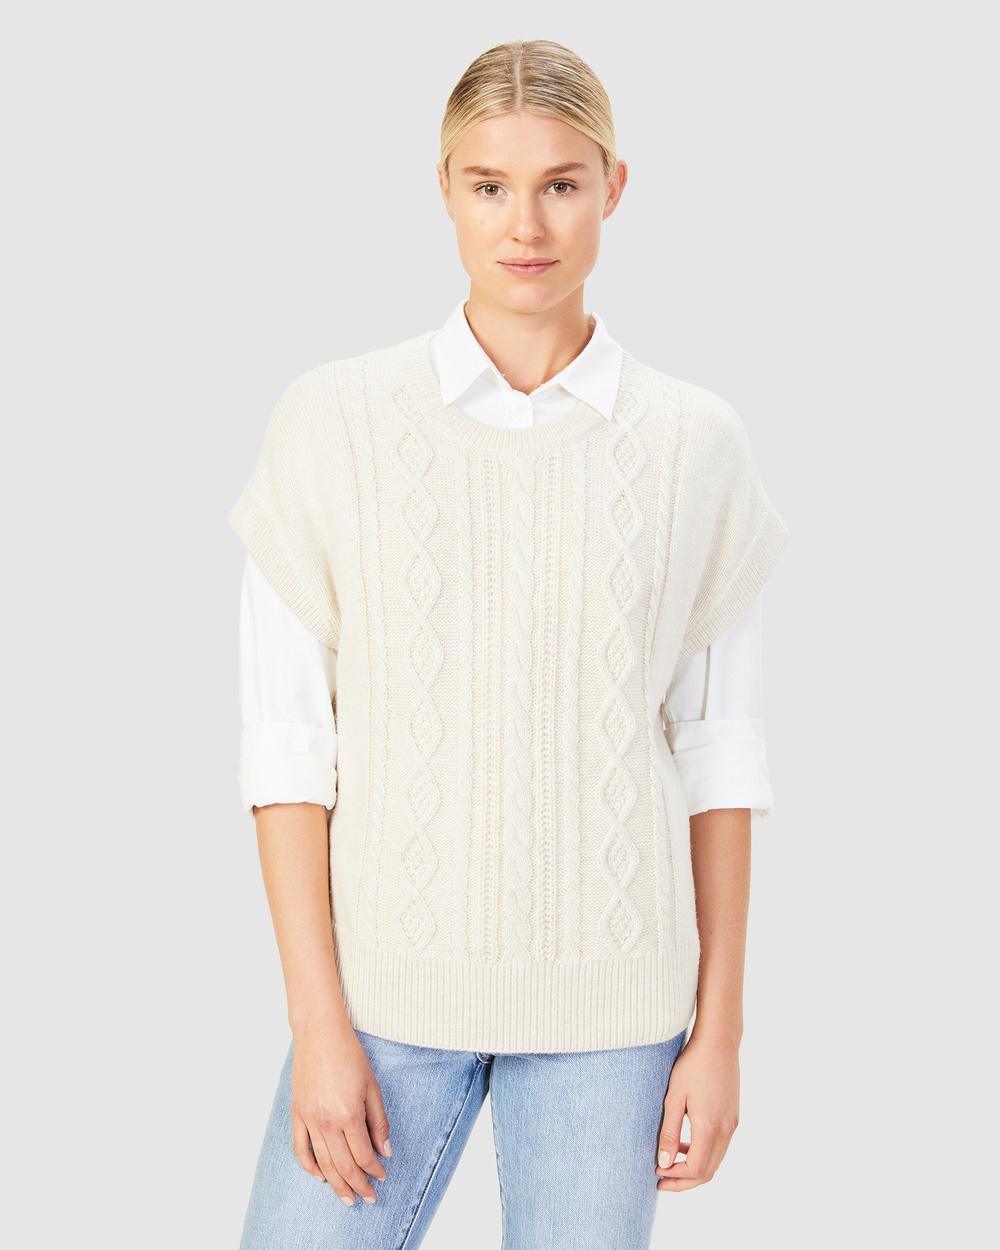 French Connection Cable Knit Vest Jumpers & Cardigans ECRU MELANGE Australia